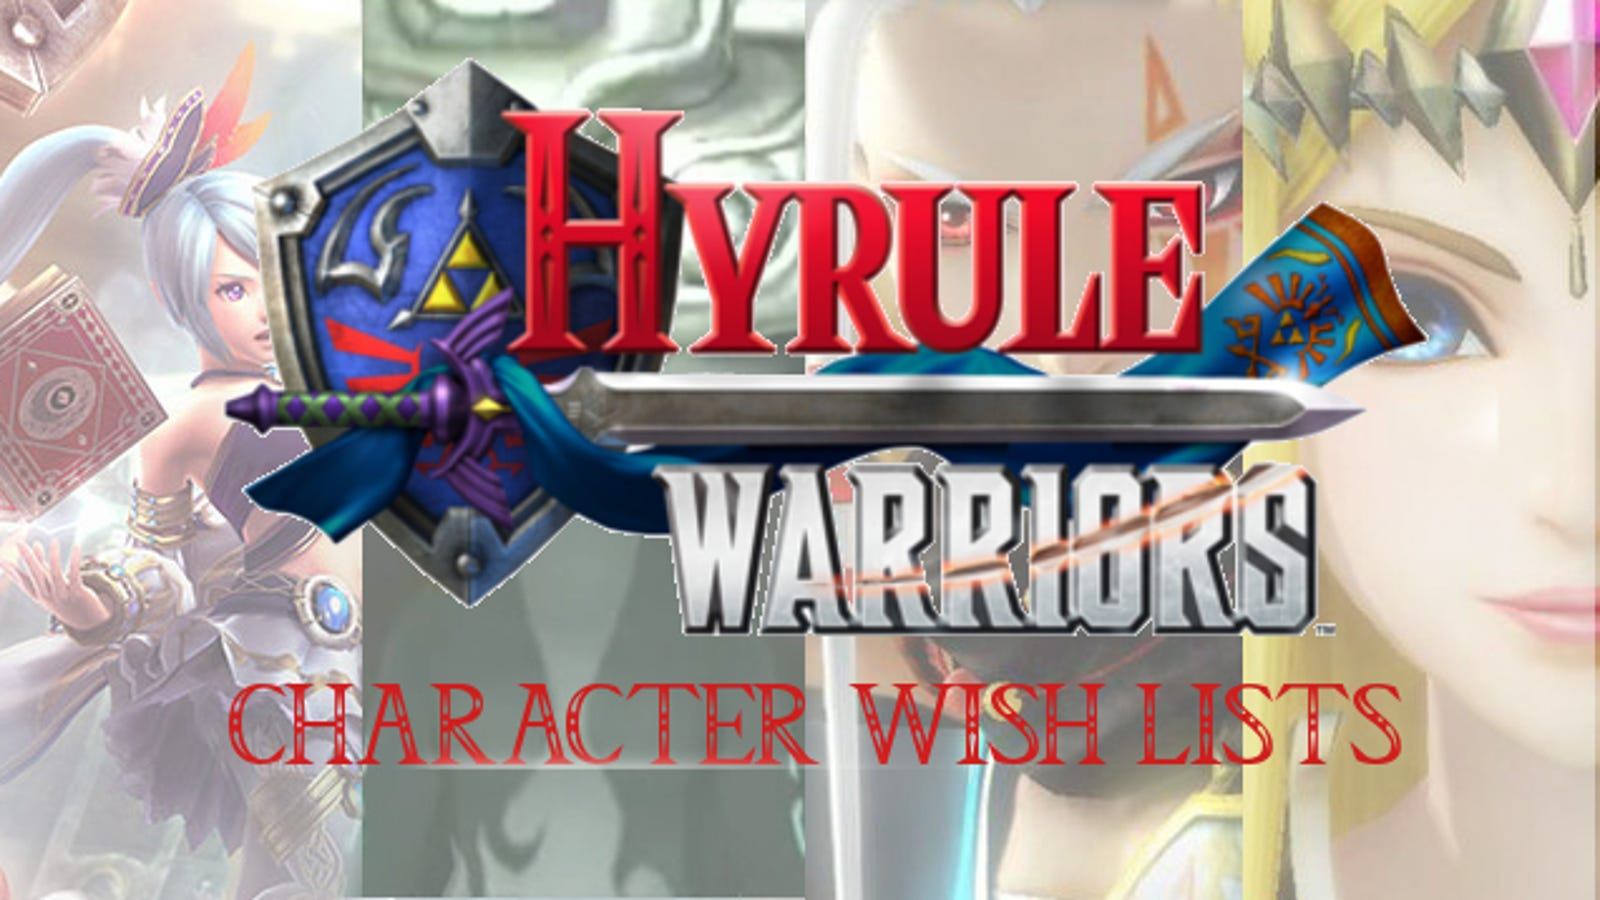 Hyrule Warriors A Character Wishlist